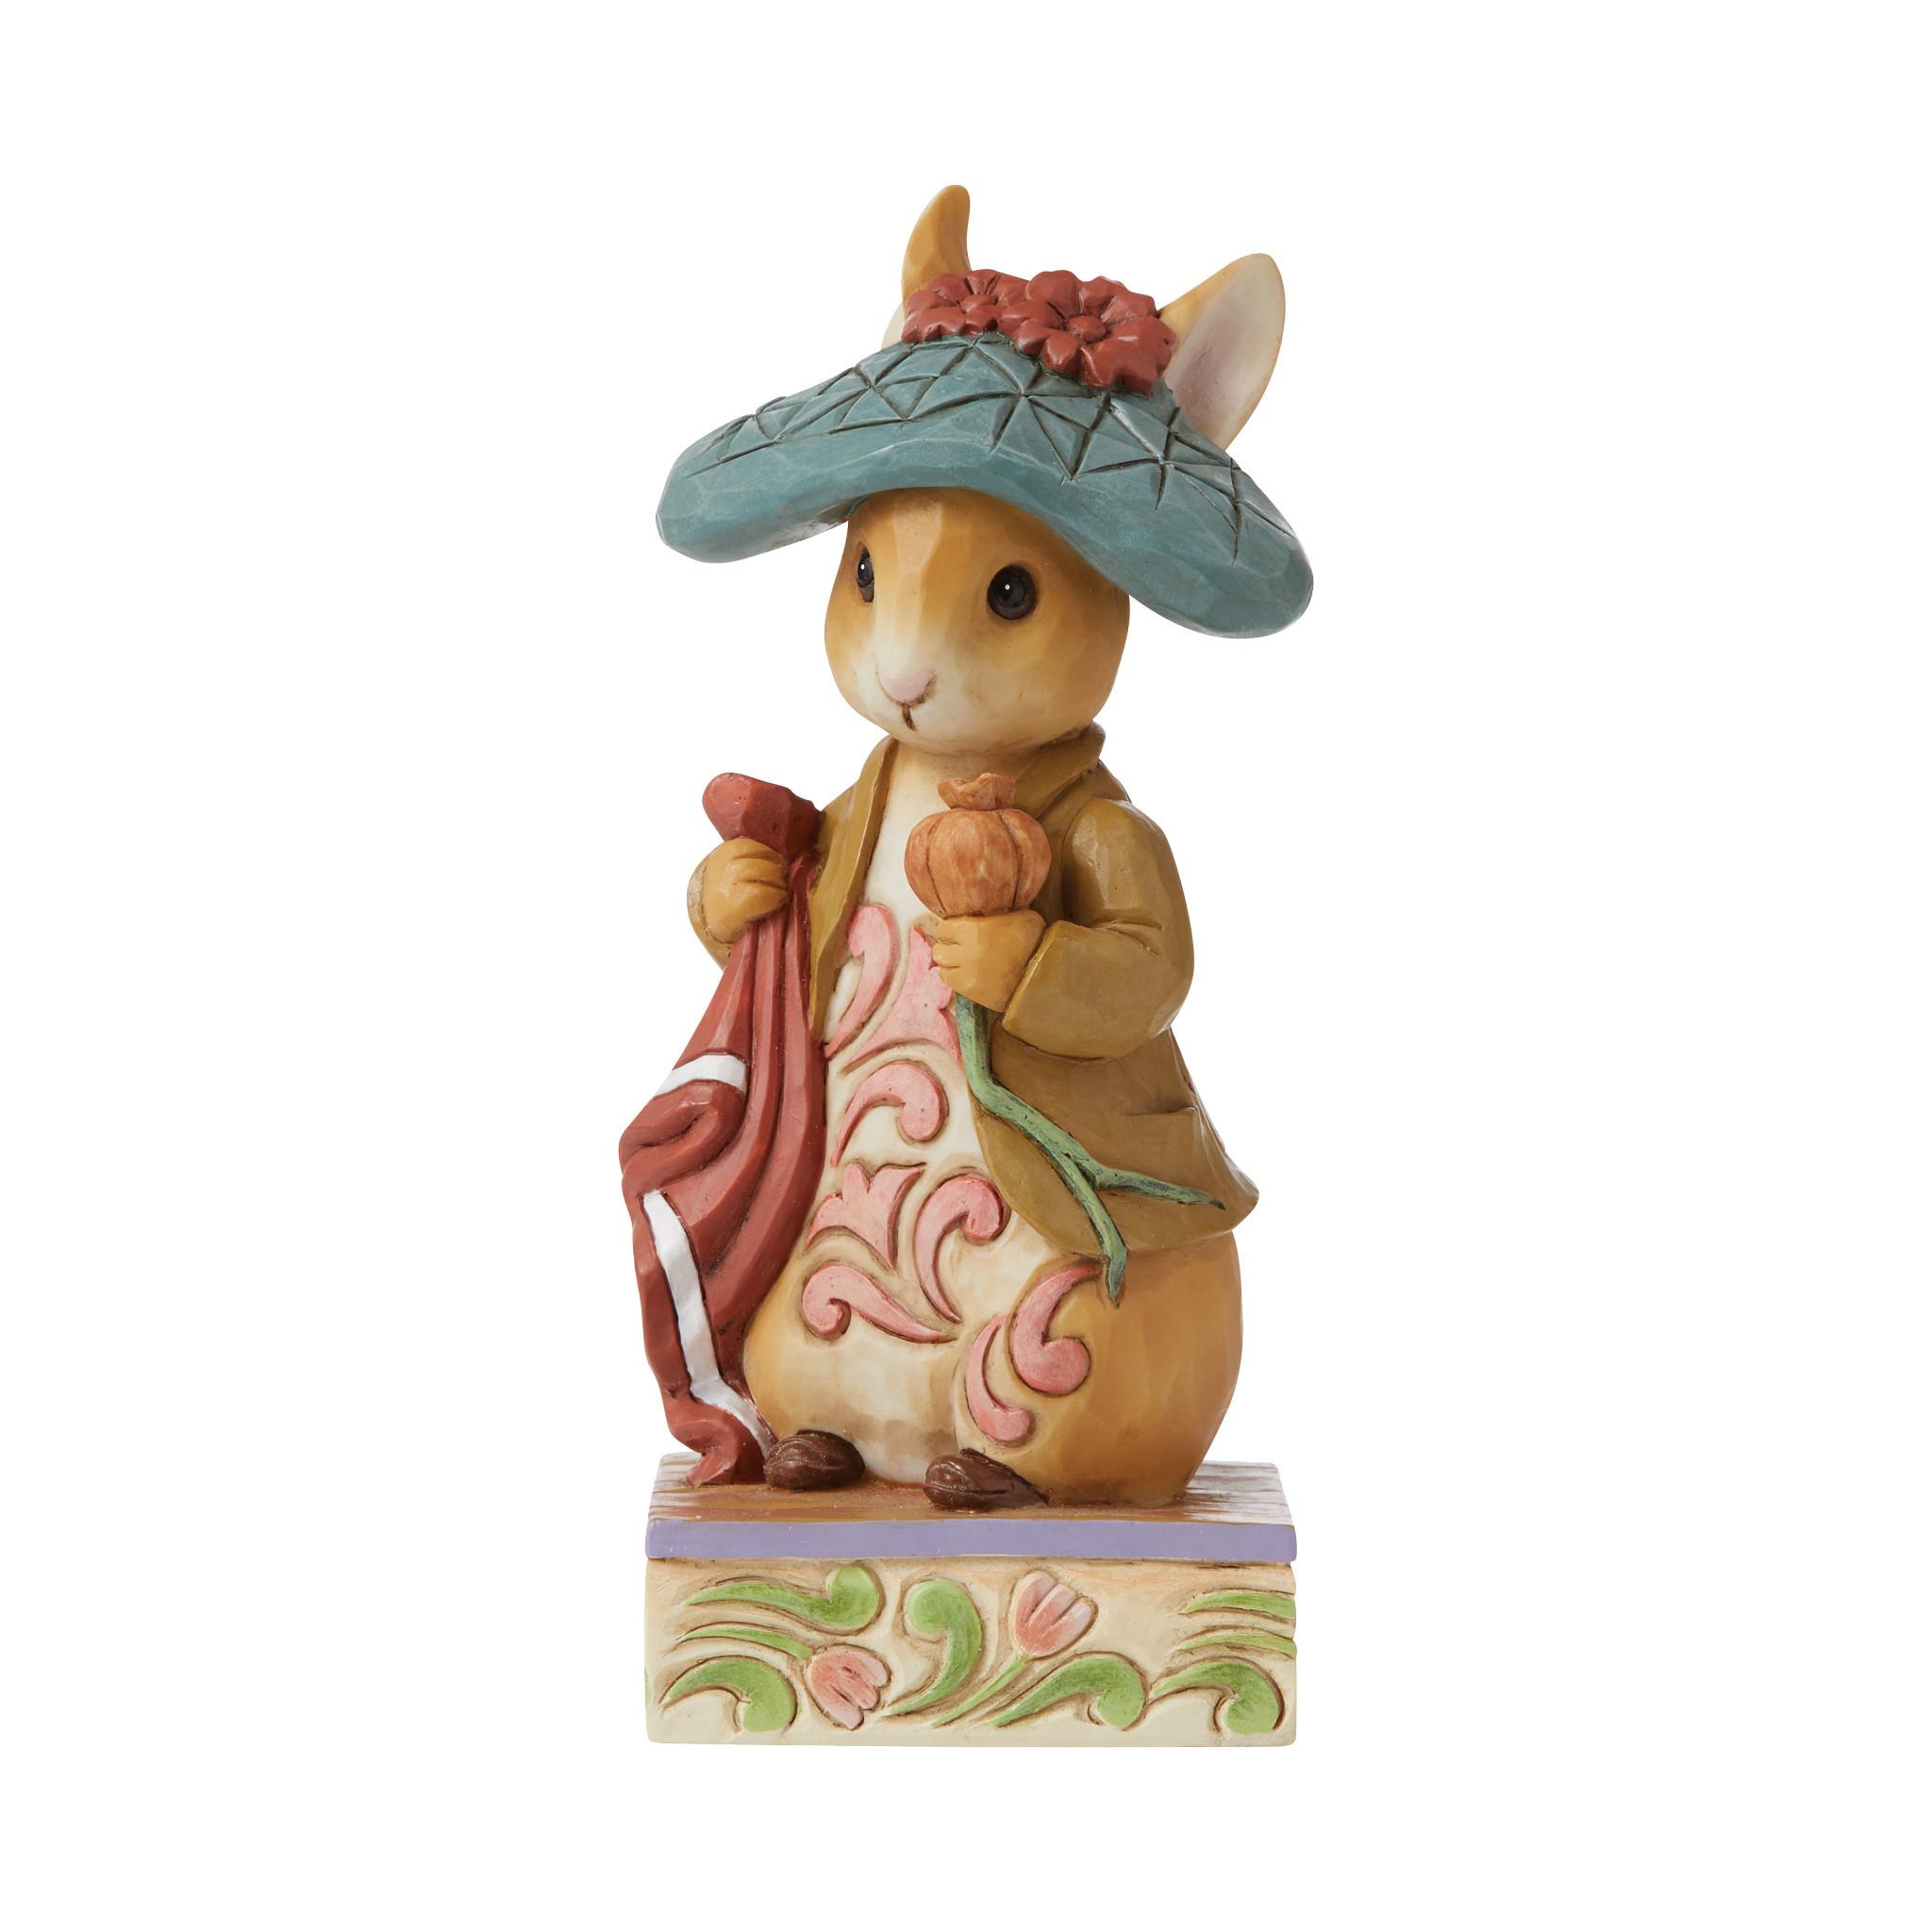 Jim Shore - Figurines 'Nibble, Nibble, Crunch! (Benjamin Bunny Figurine) N' 2021